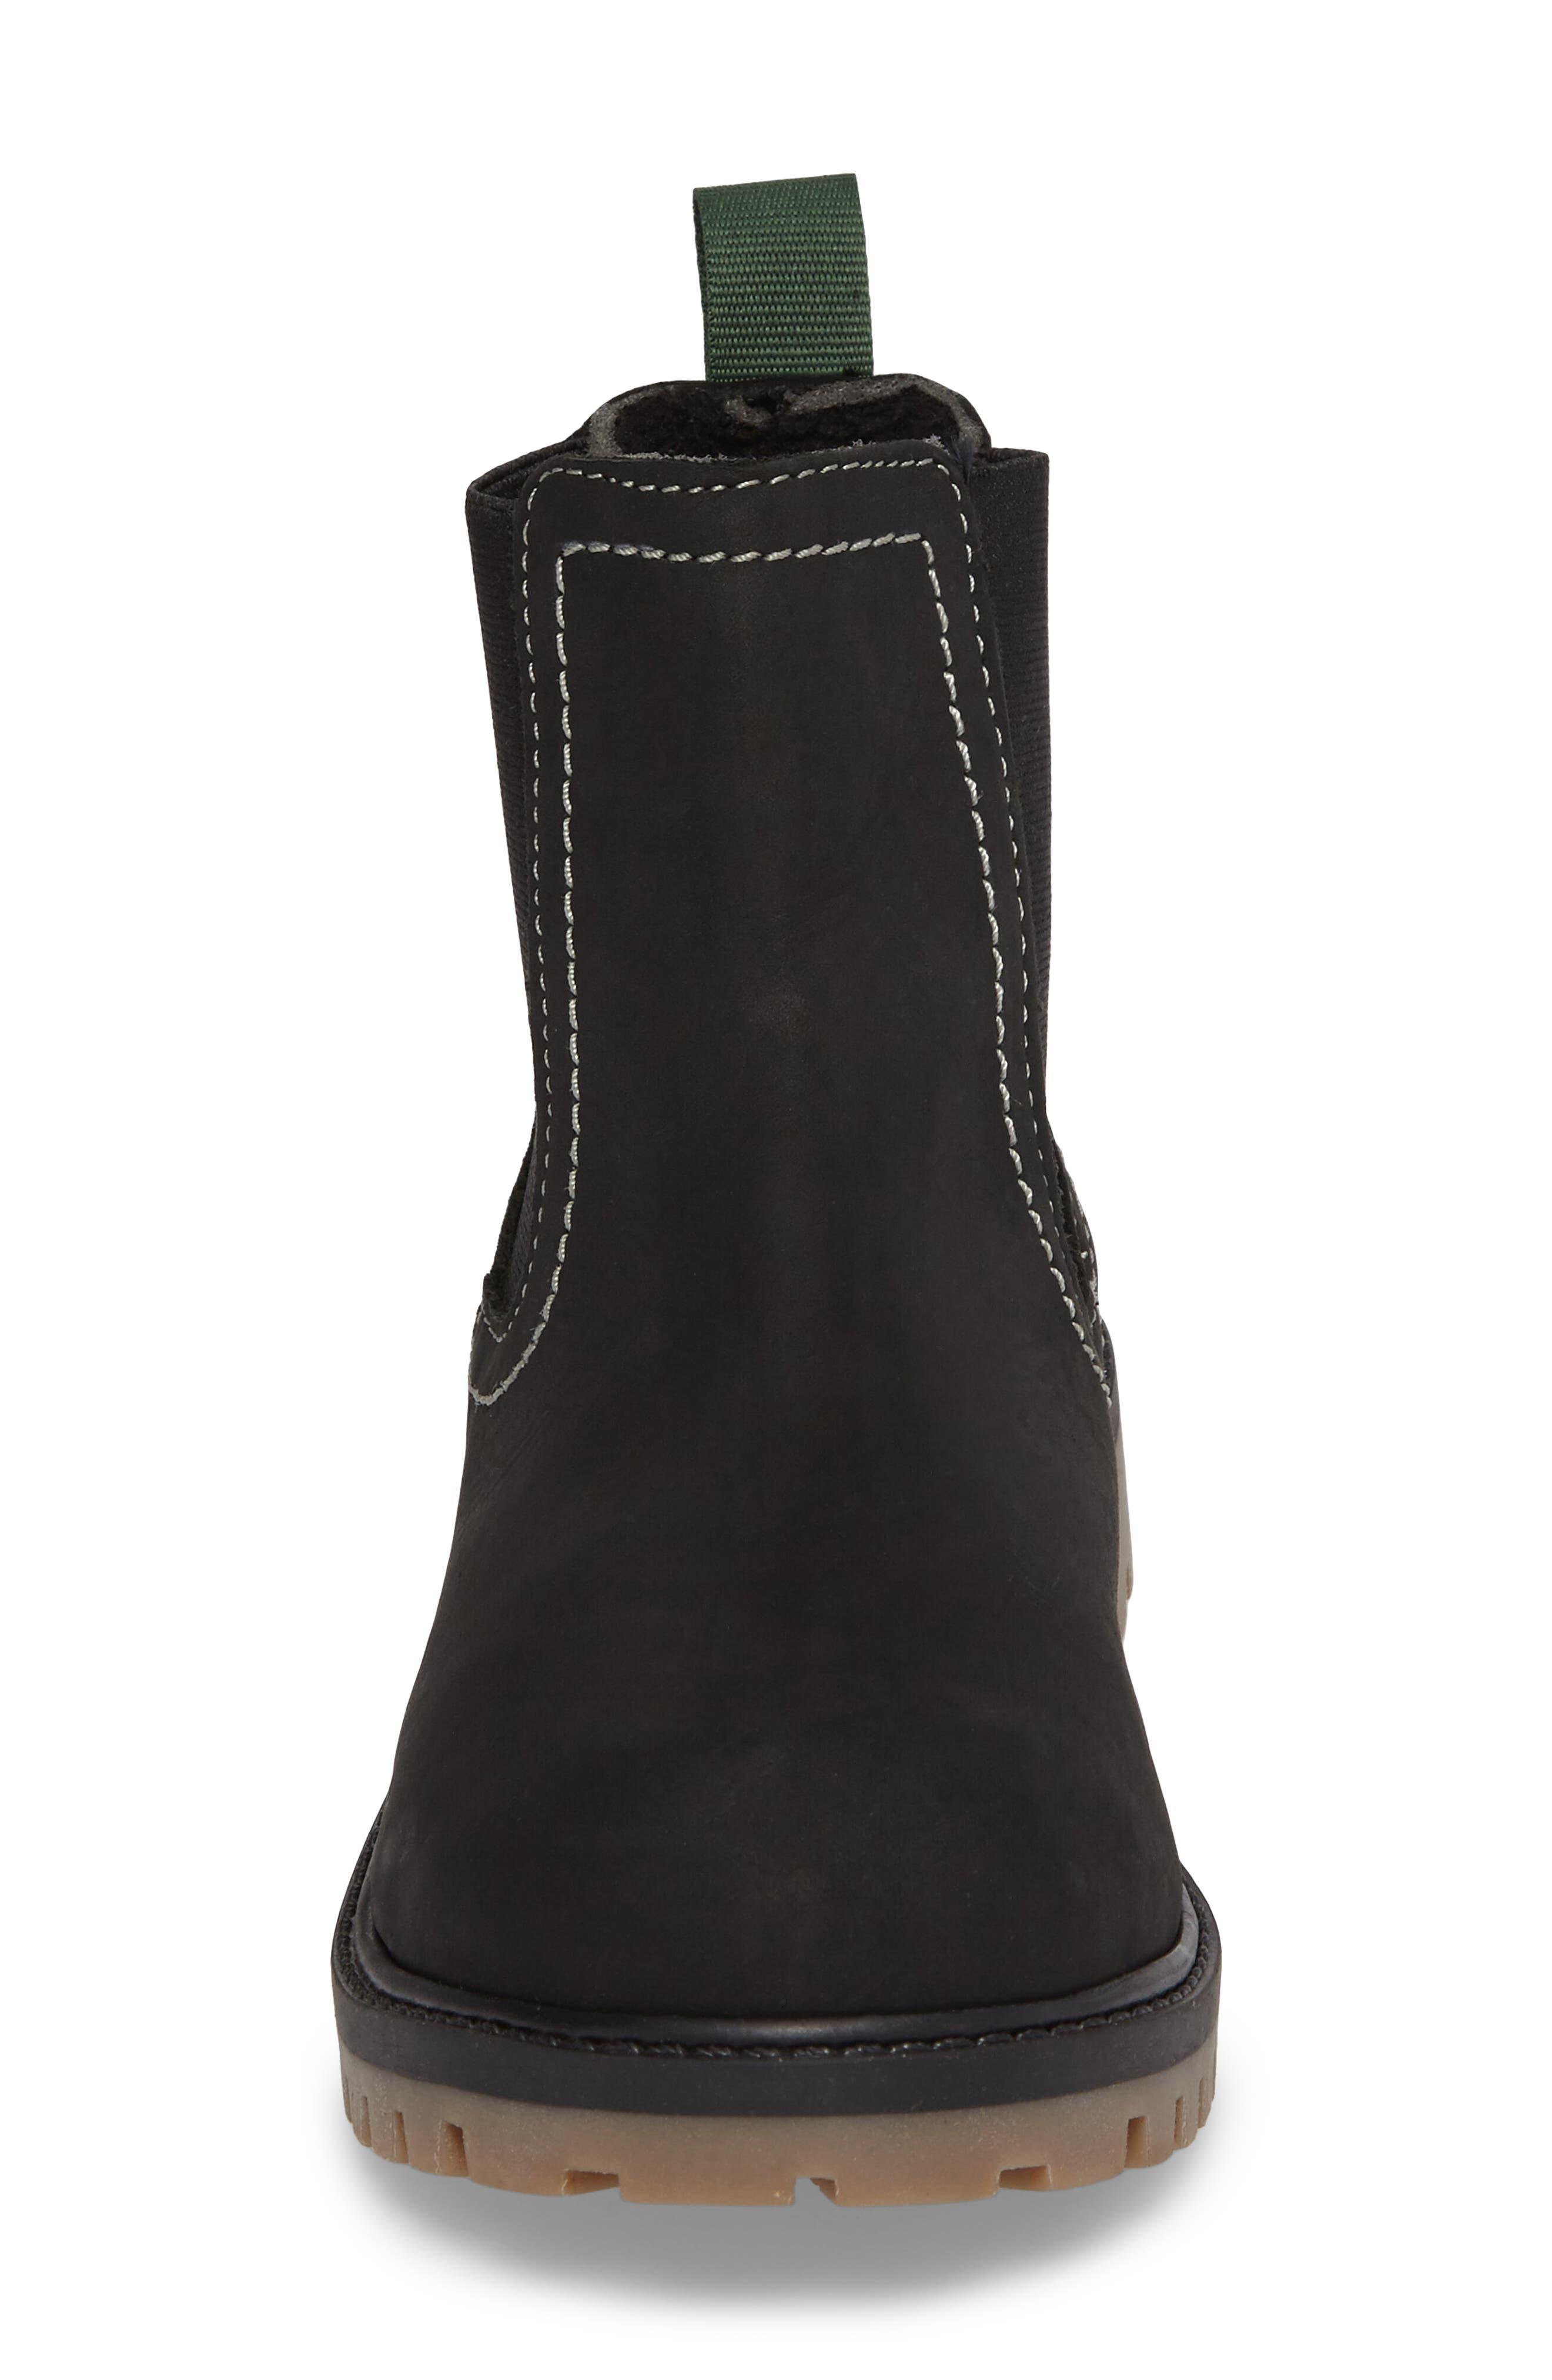 TakodaC Waterproof Chelsea Boot,                             Alternate thumbnail 4, color,                             Black